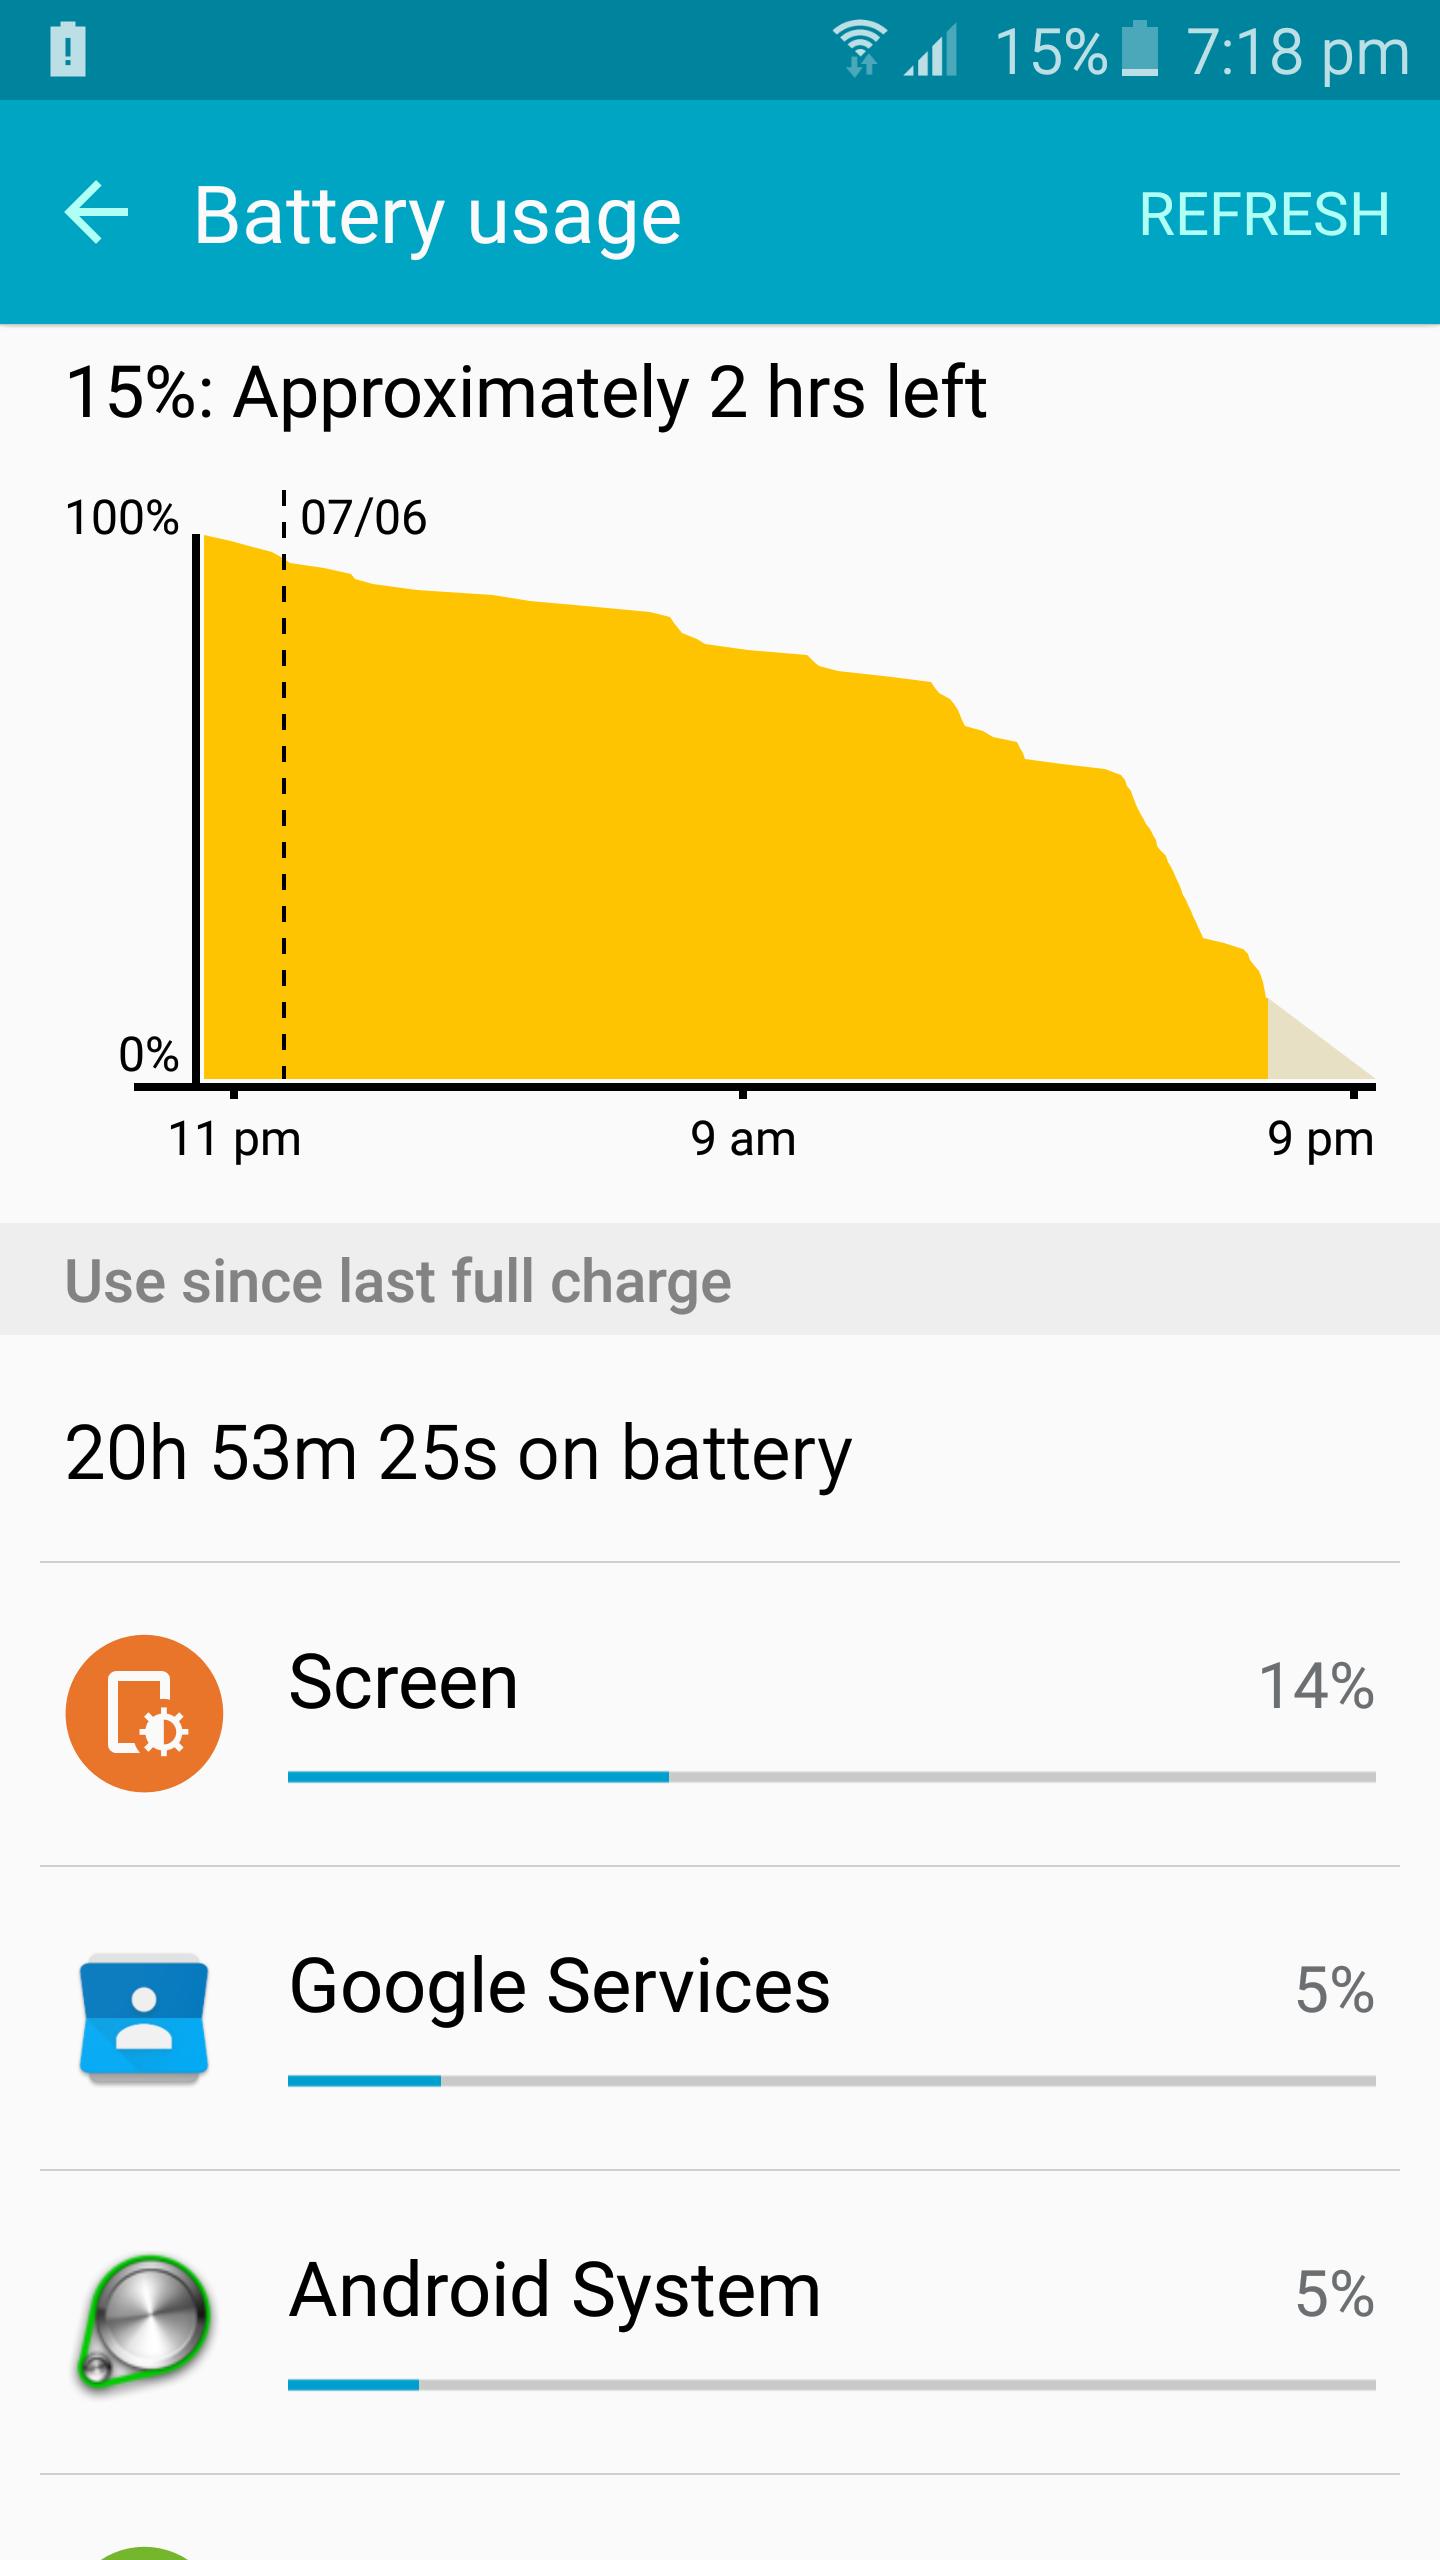 Samsung Galaxy S6 Battery Life - 1